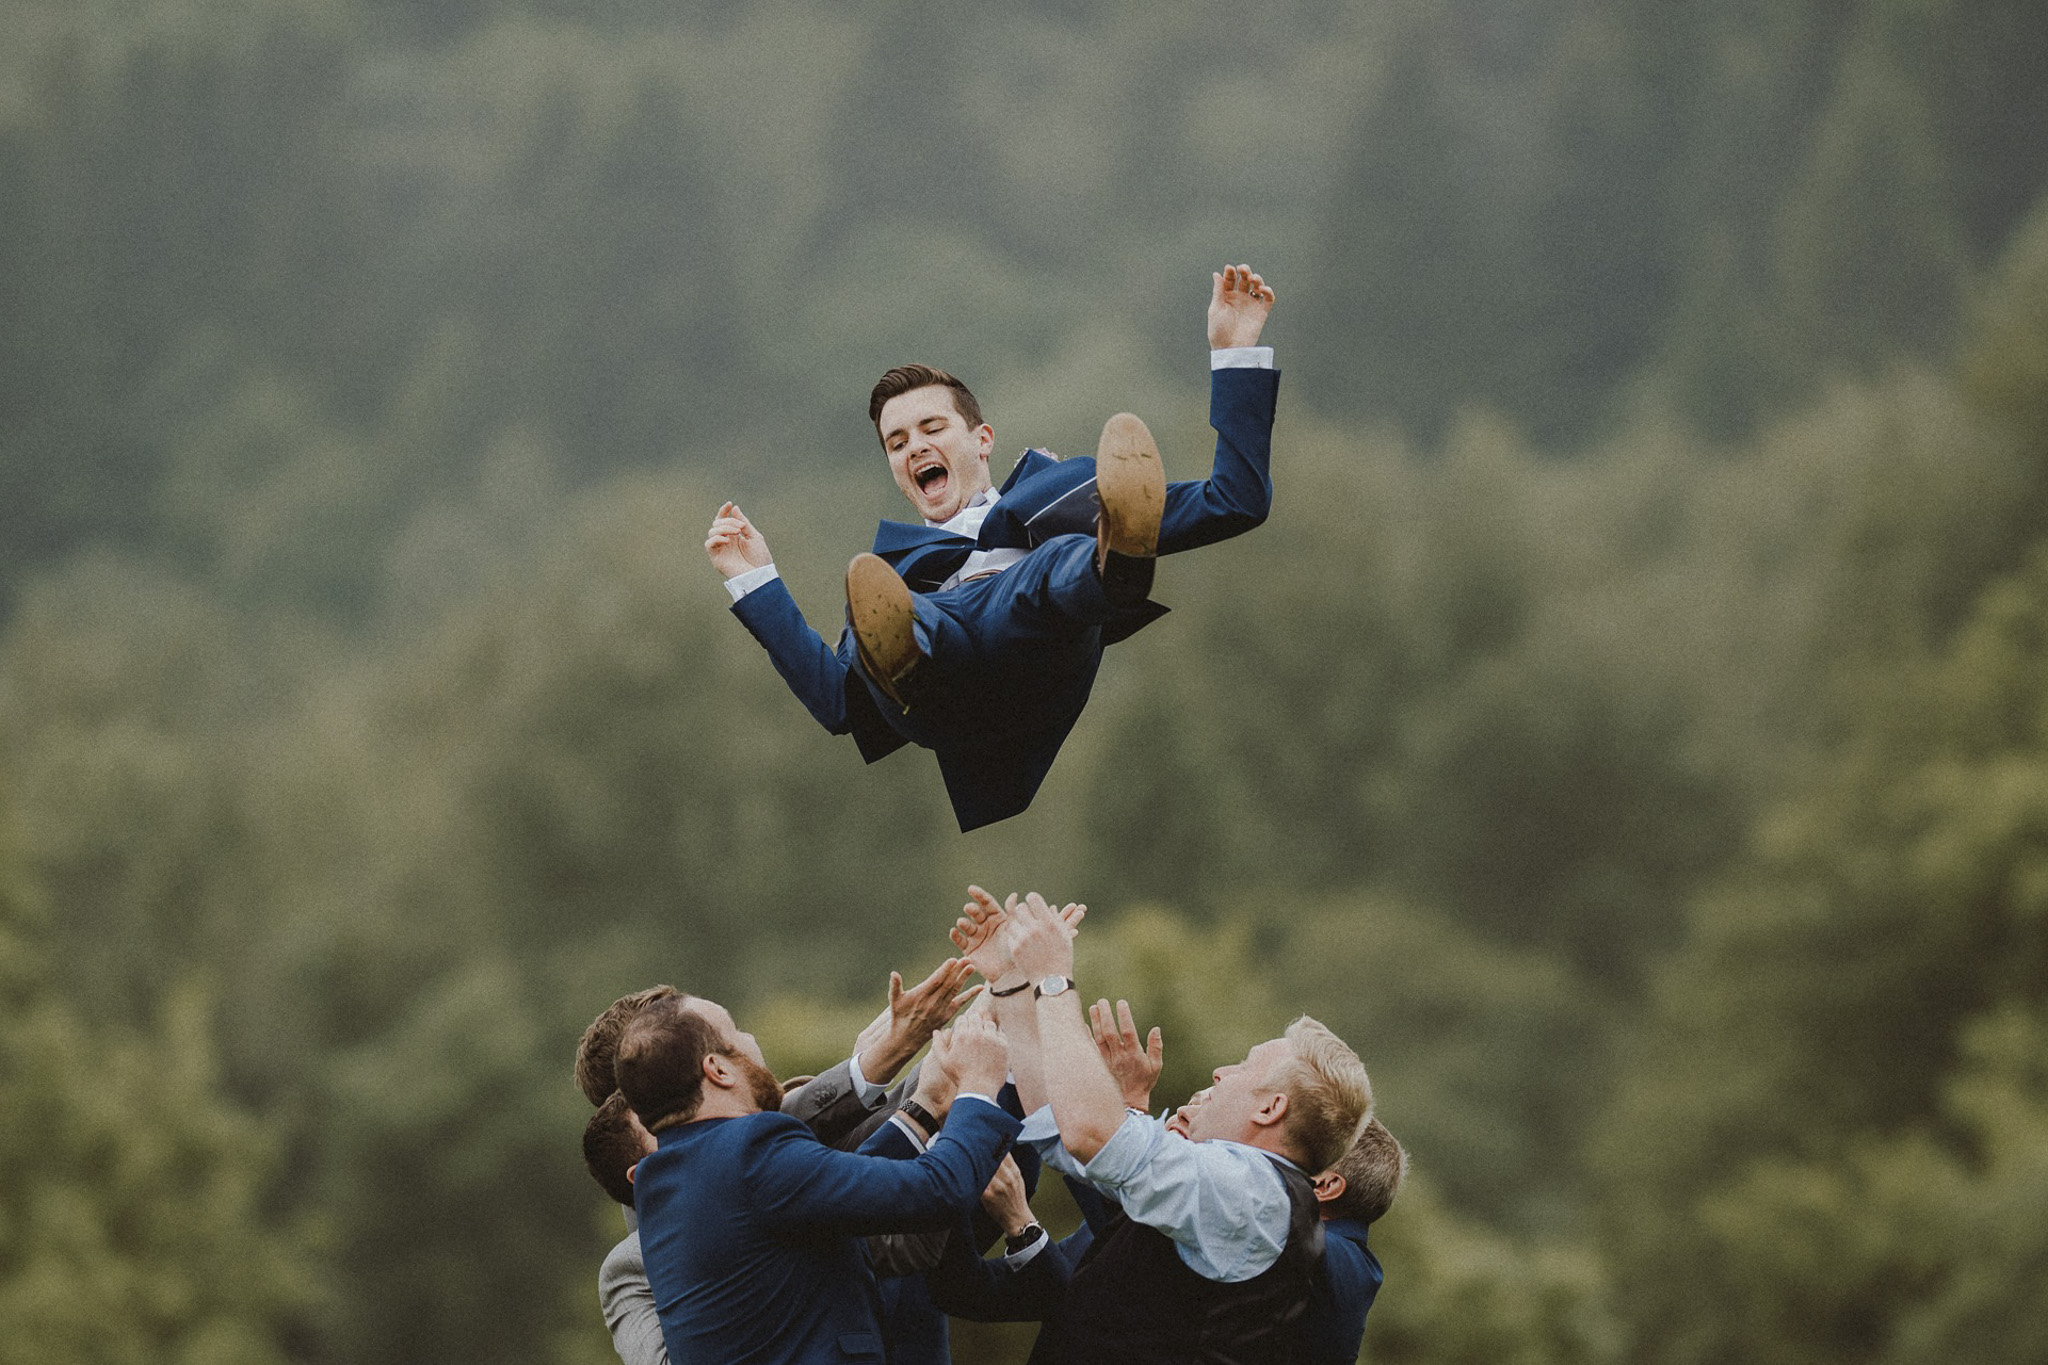 Unique and fun groomsmen wedding photo